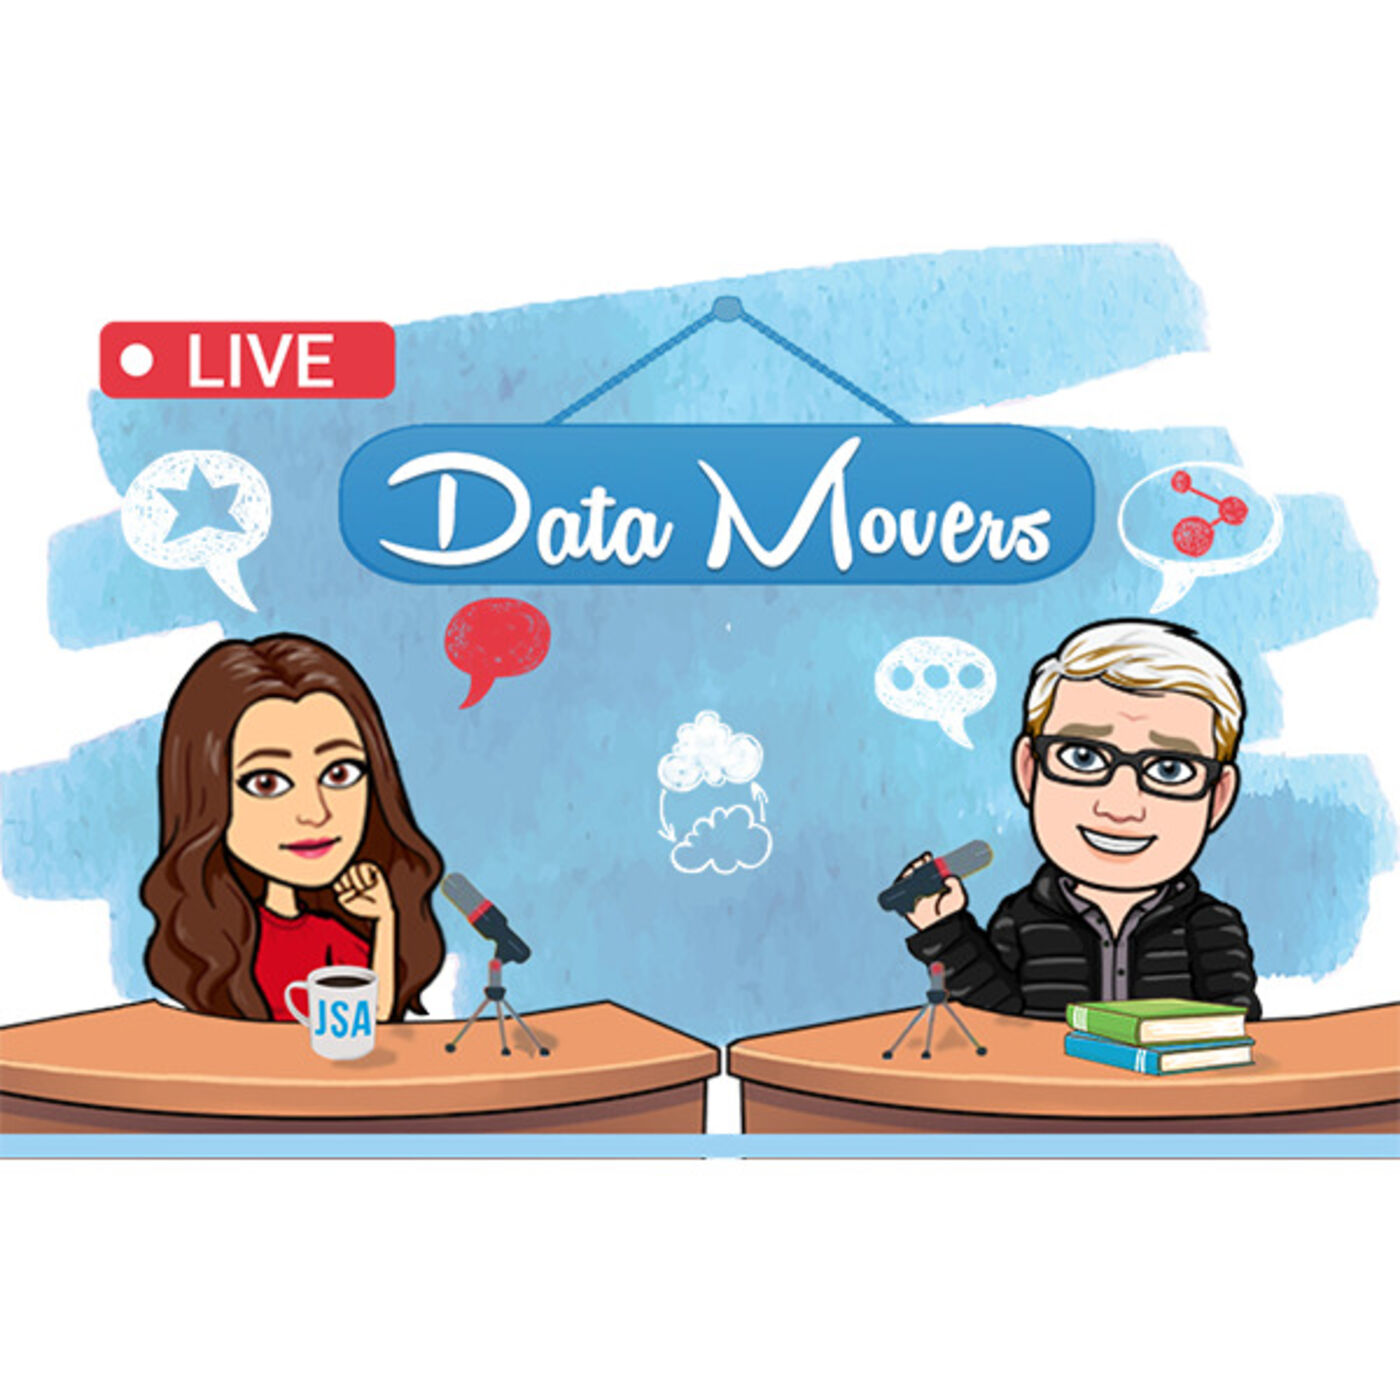 Data Movers Podcast - Avner Papouchado of Serverfarm: Where Aviation, Surfing & Data Center Management Meet